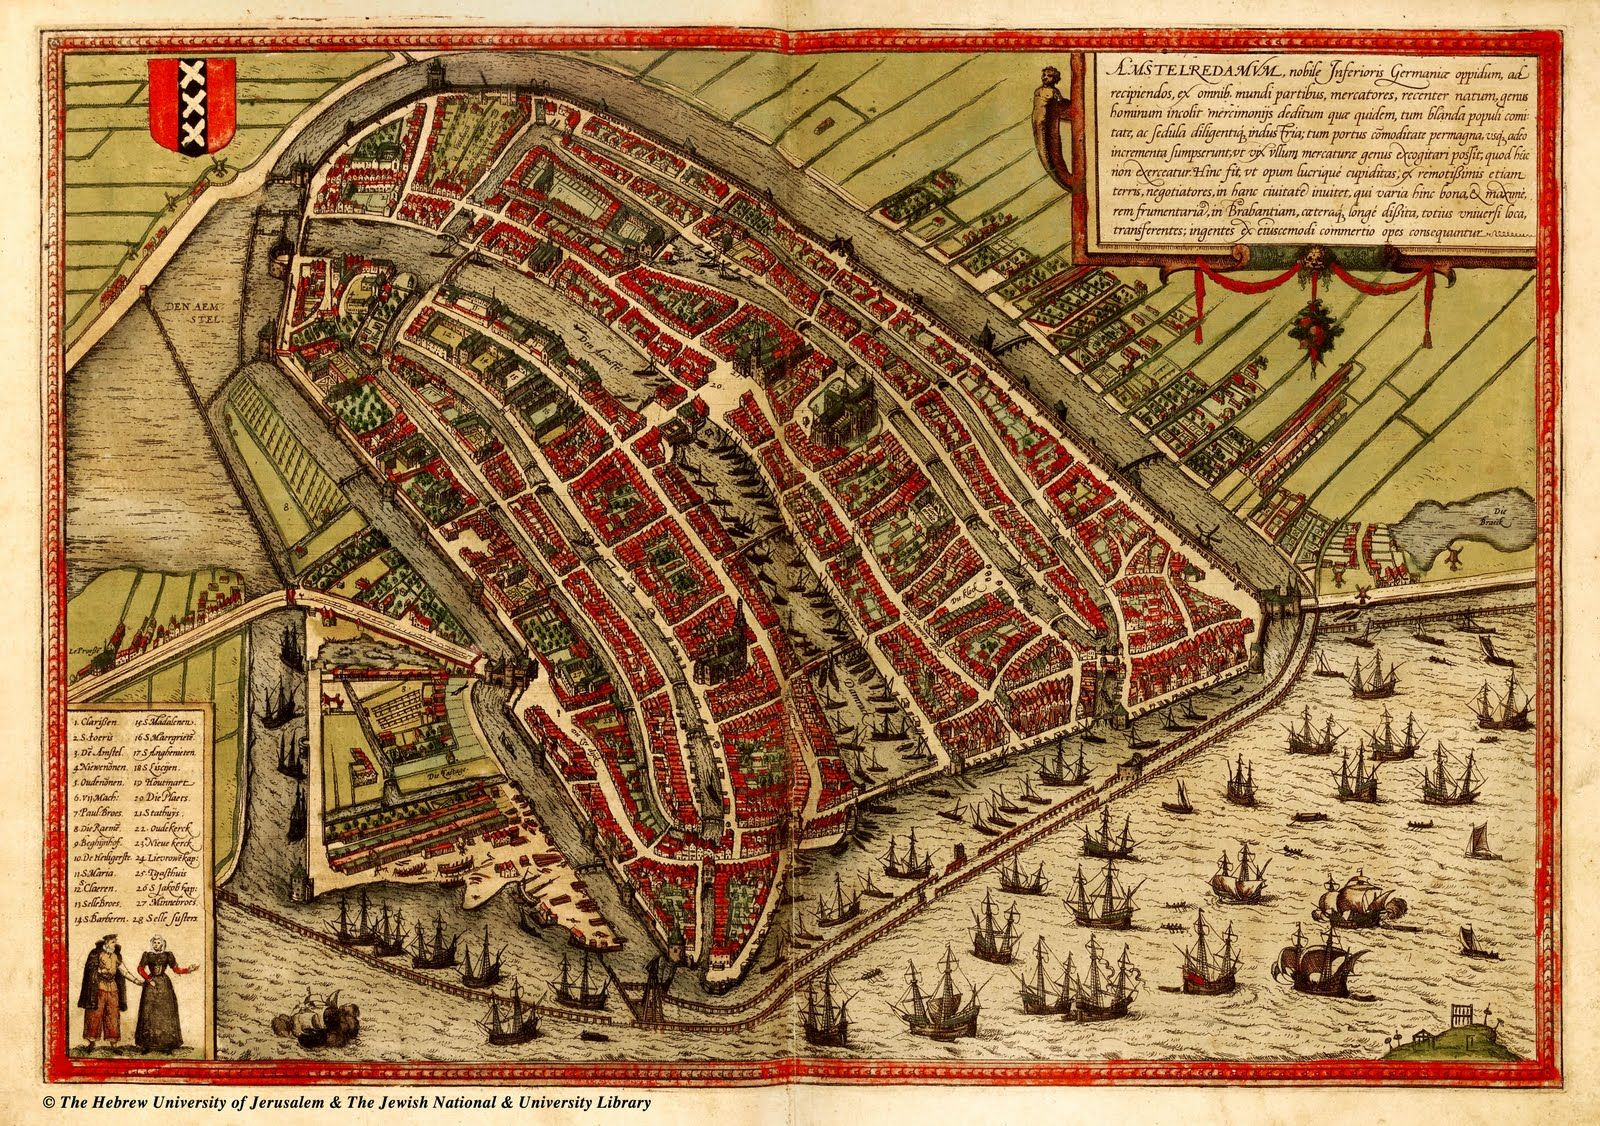 HttpbpblogspotcomiJZcKzsaUTbhJcYtFIAAAAAAAAARk - Amsterdam old map